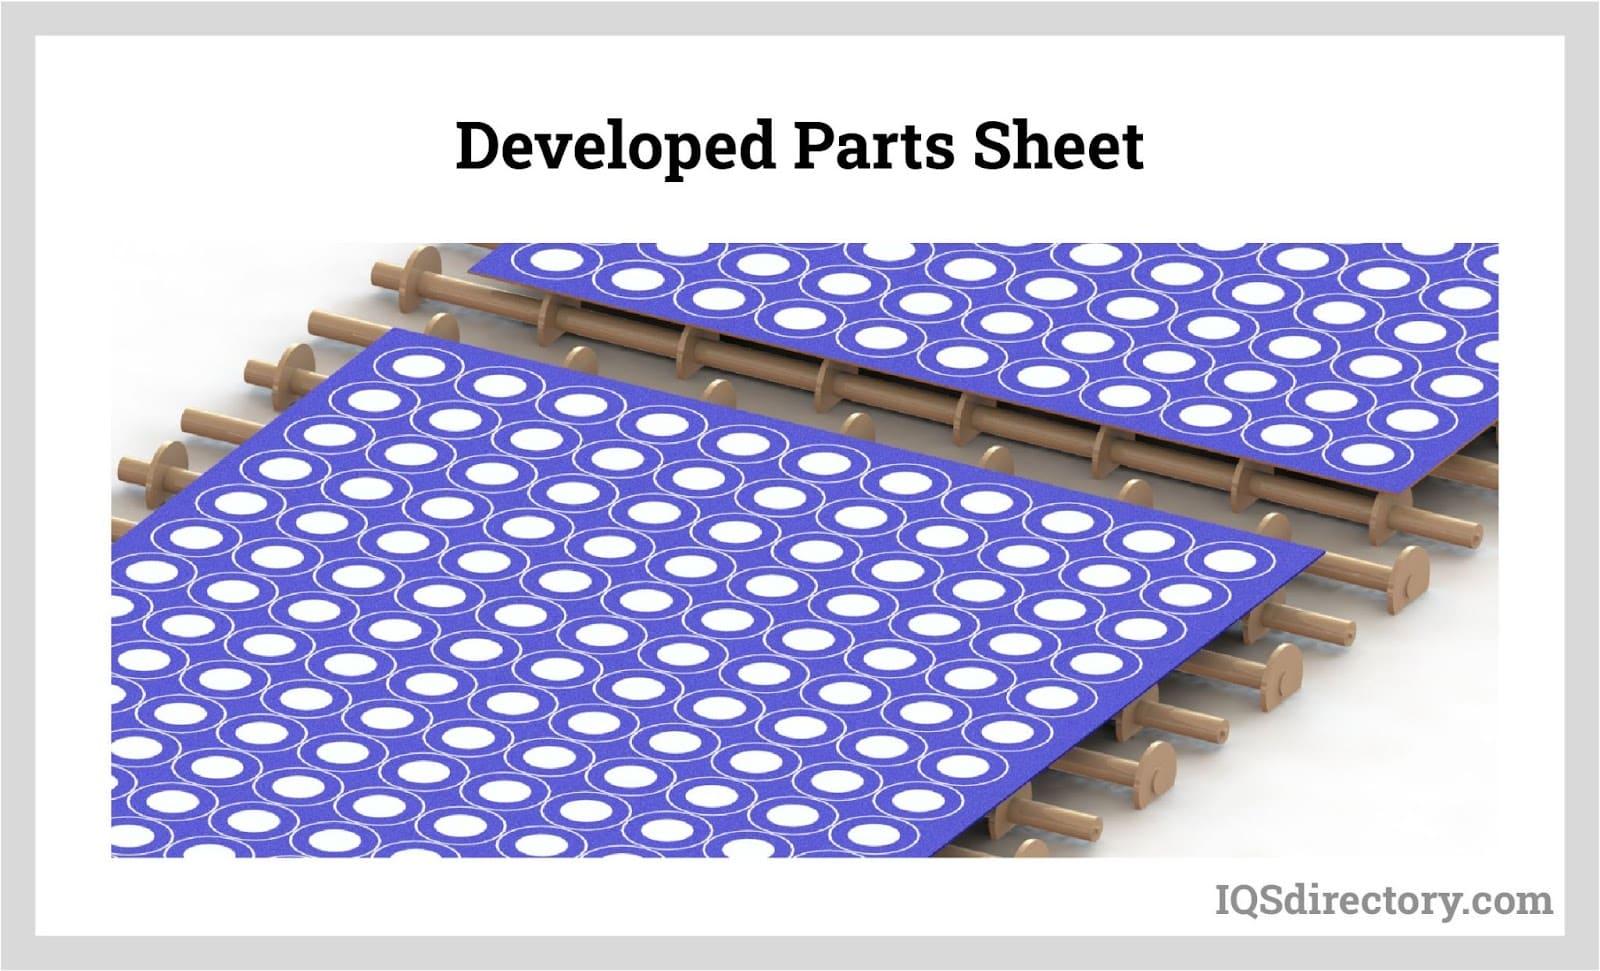 Developed Parts Sheet